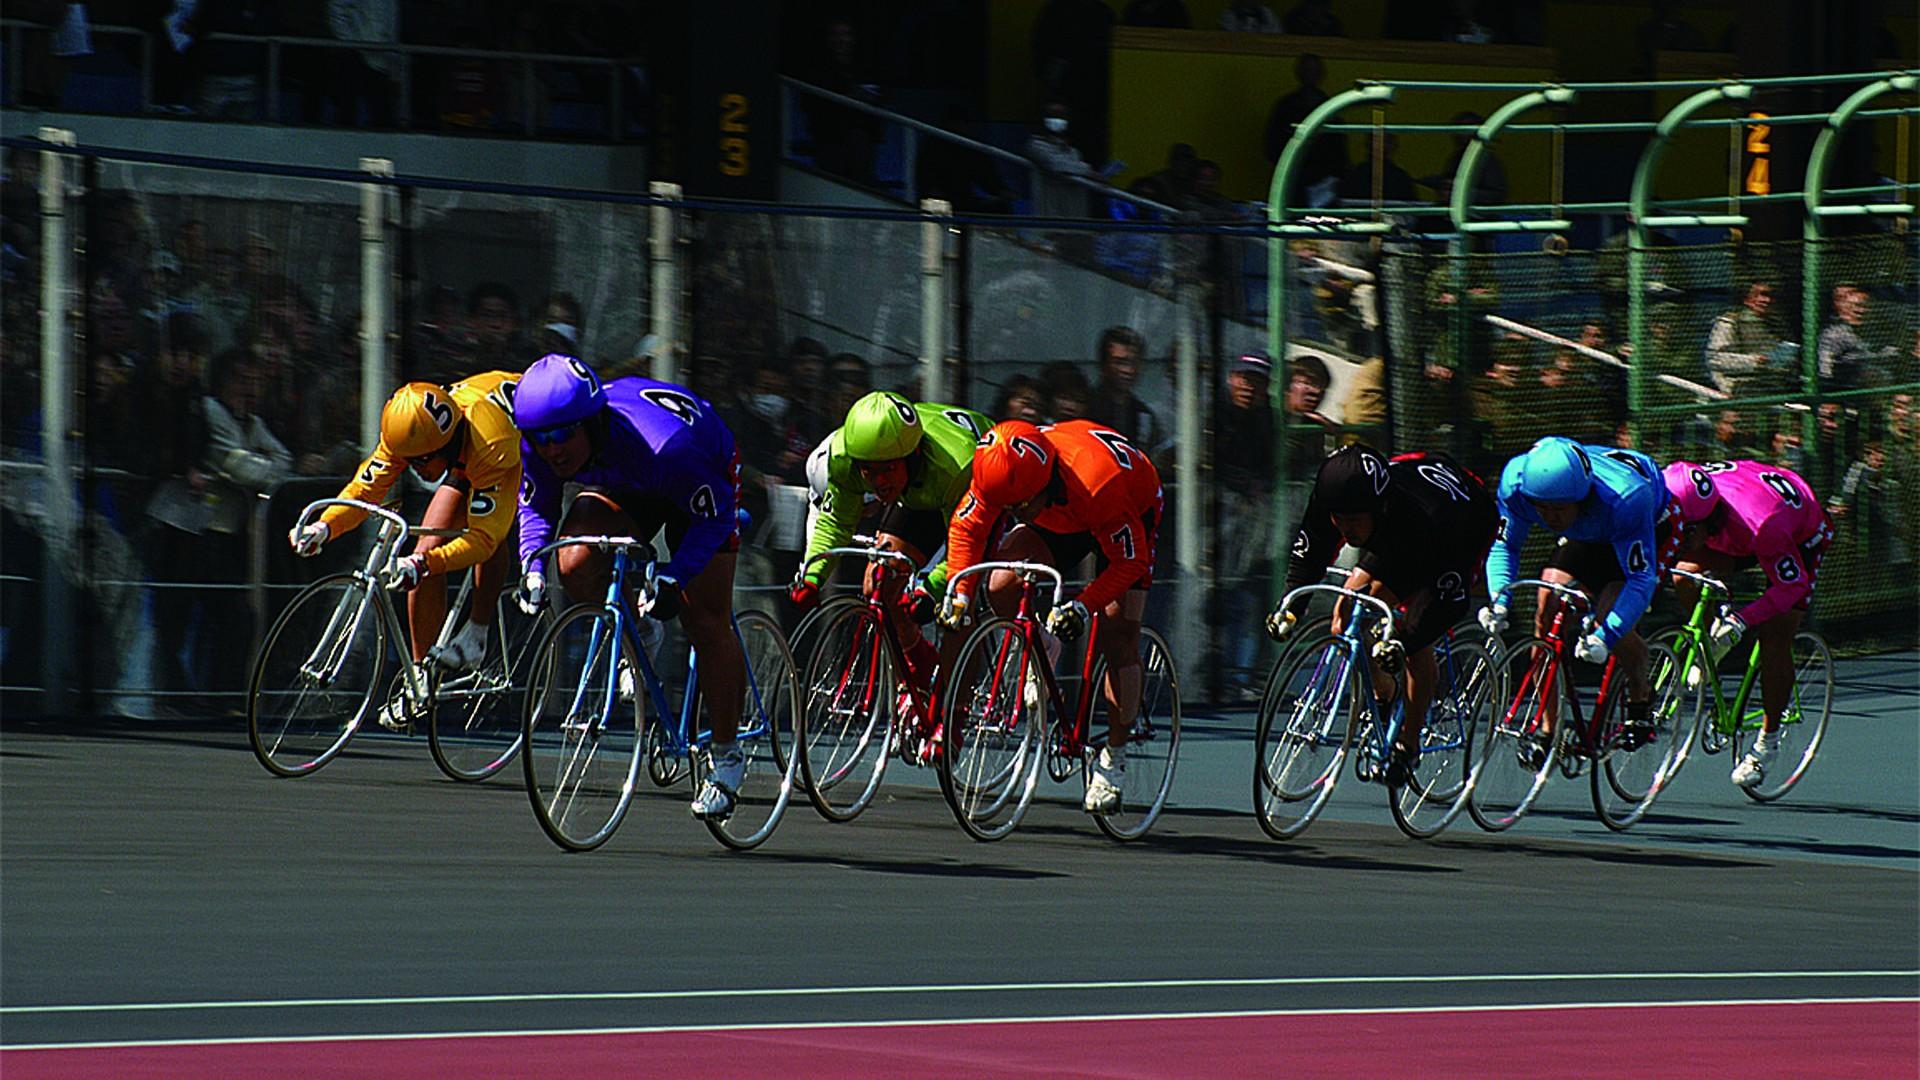 Cyclisme sur piste à Hiratsuka